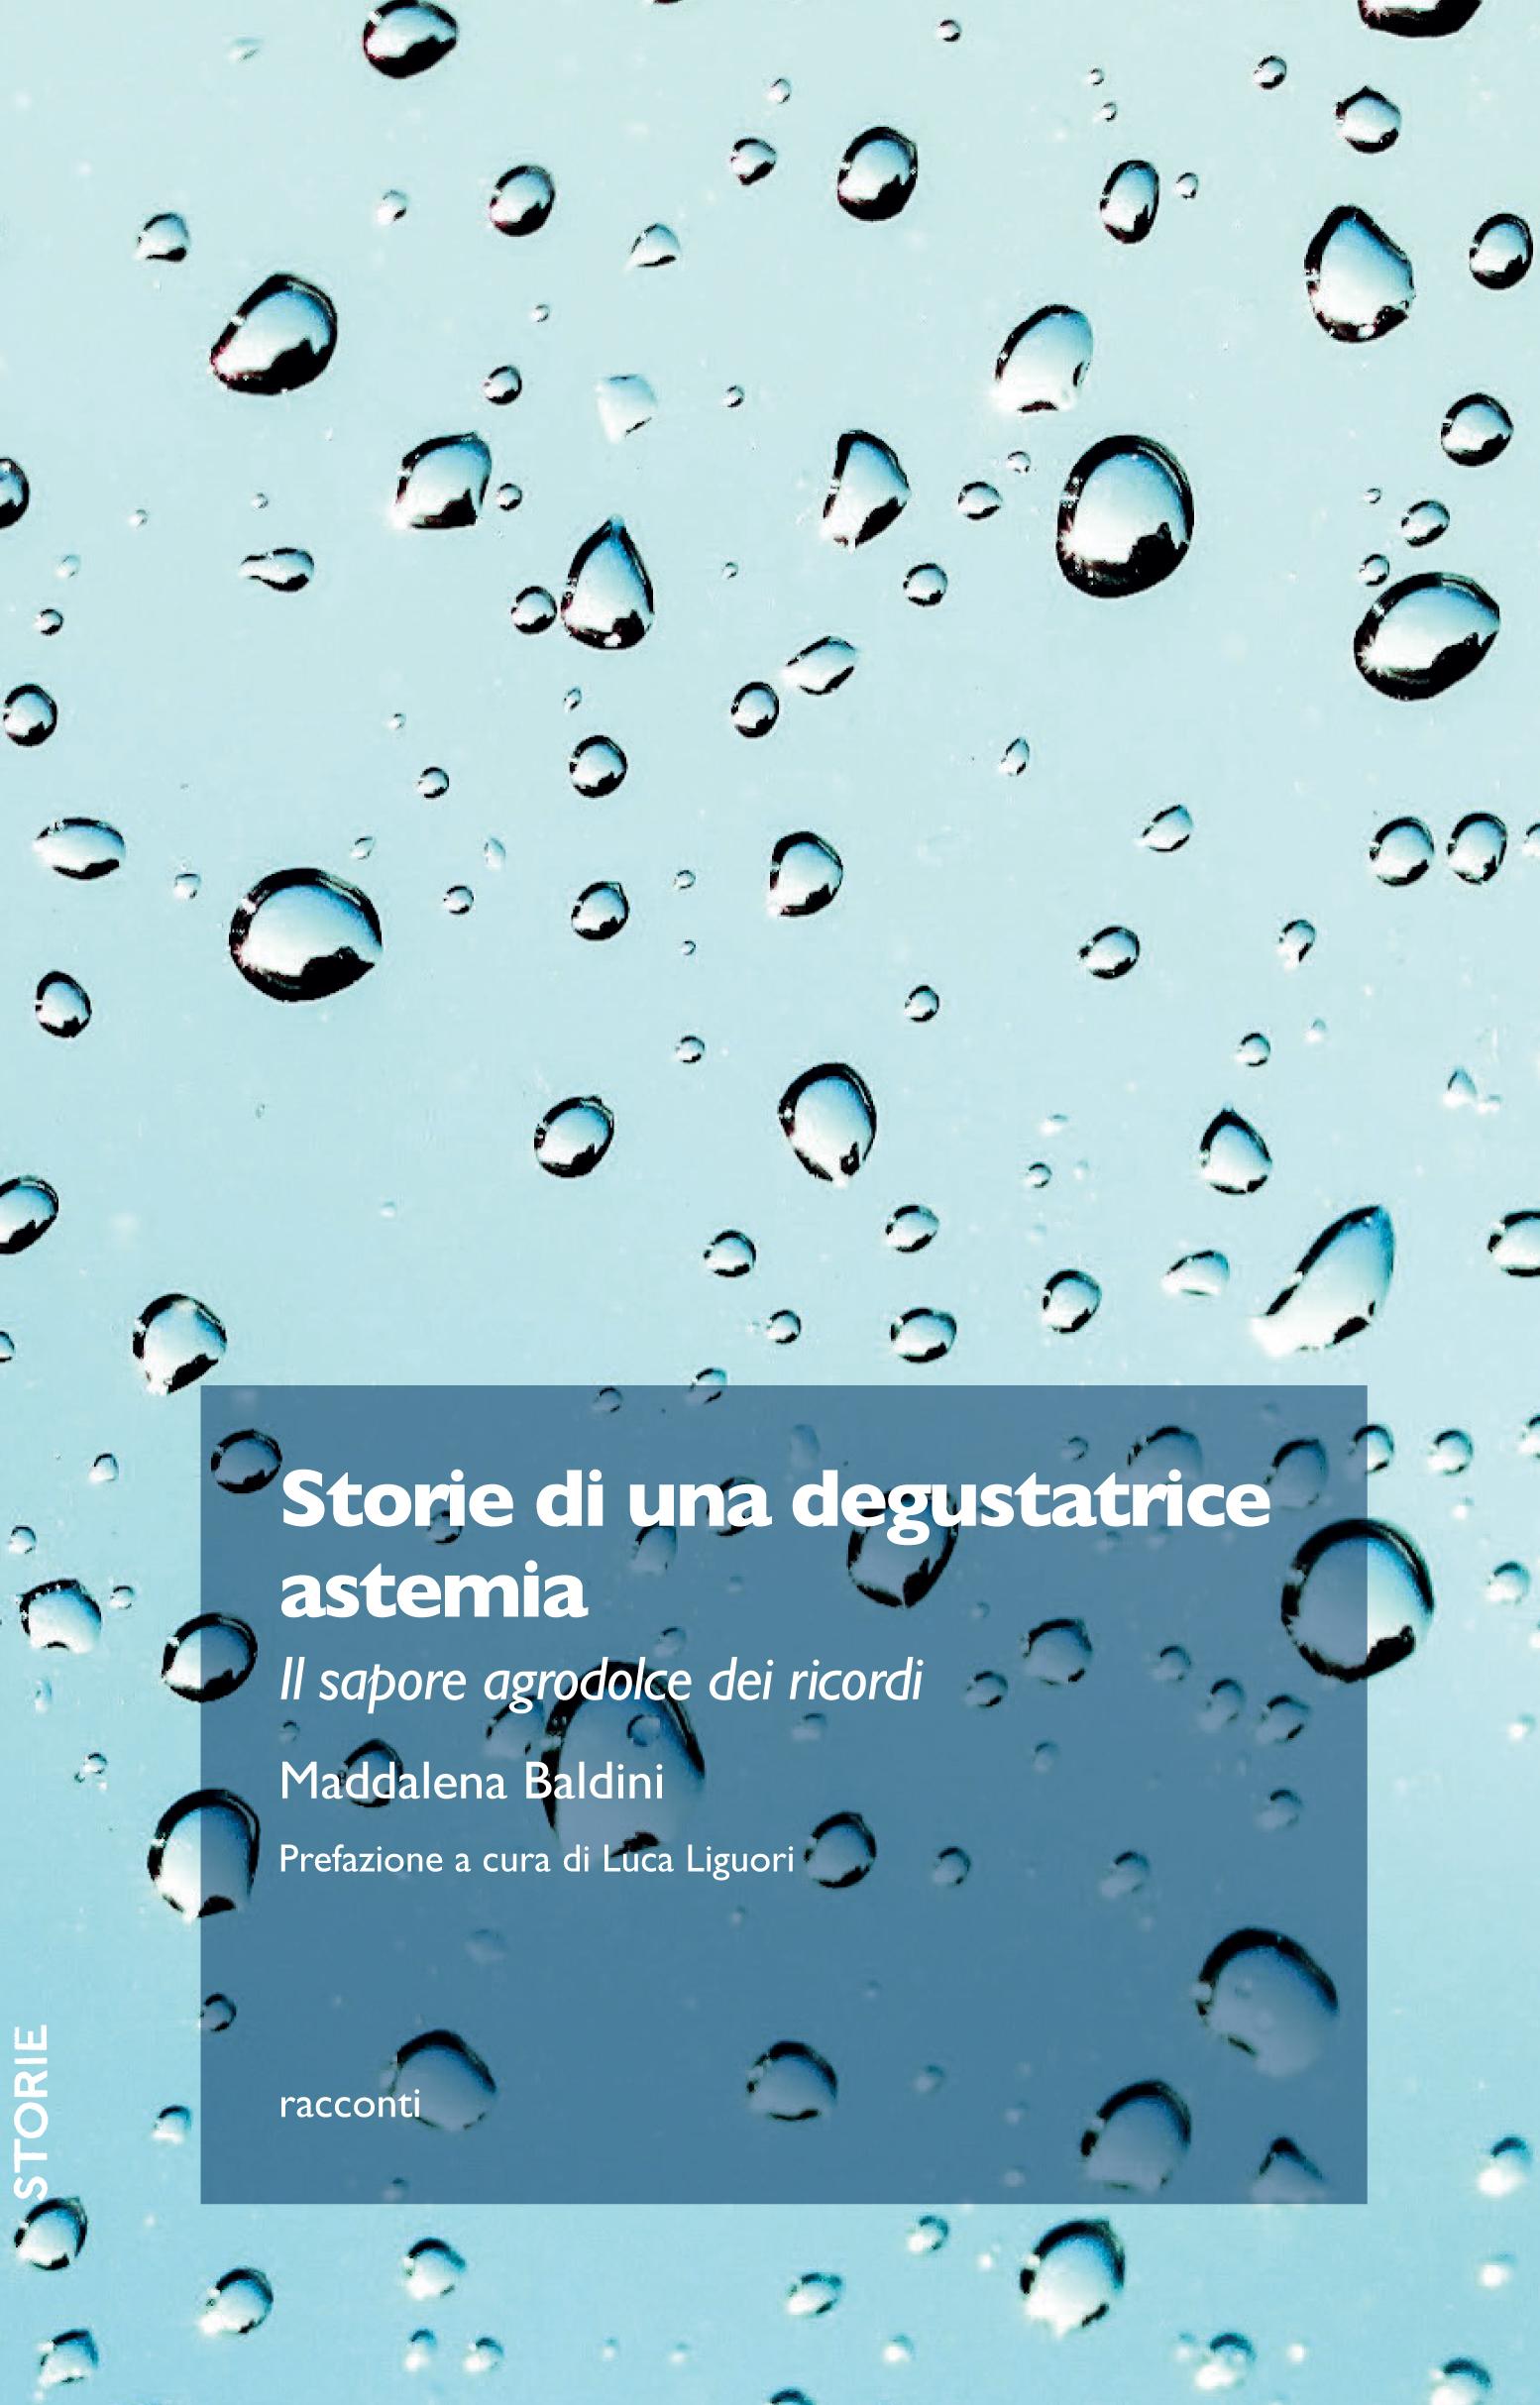 Cover_Storie_di_una_degustatrice_astemia